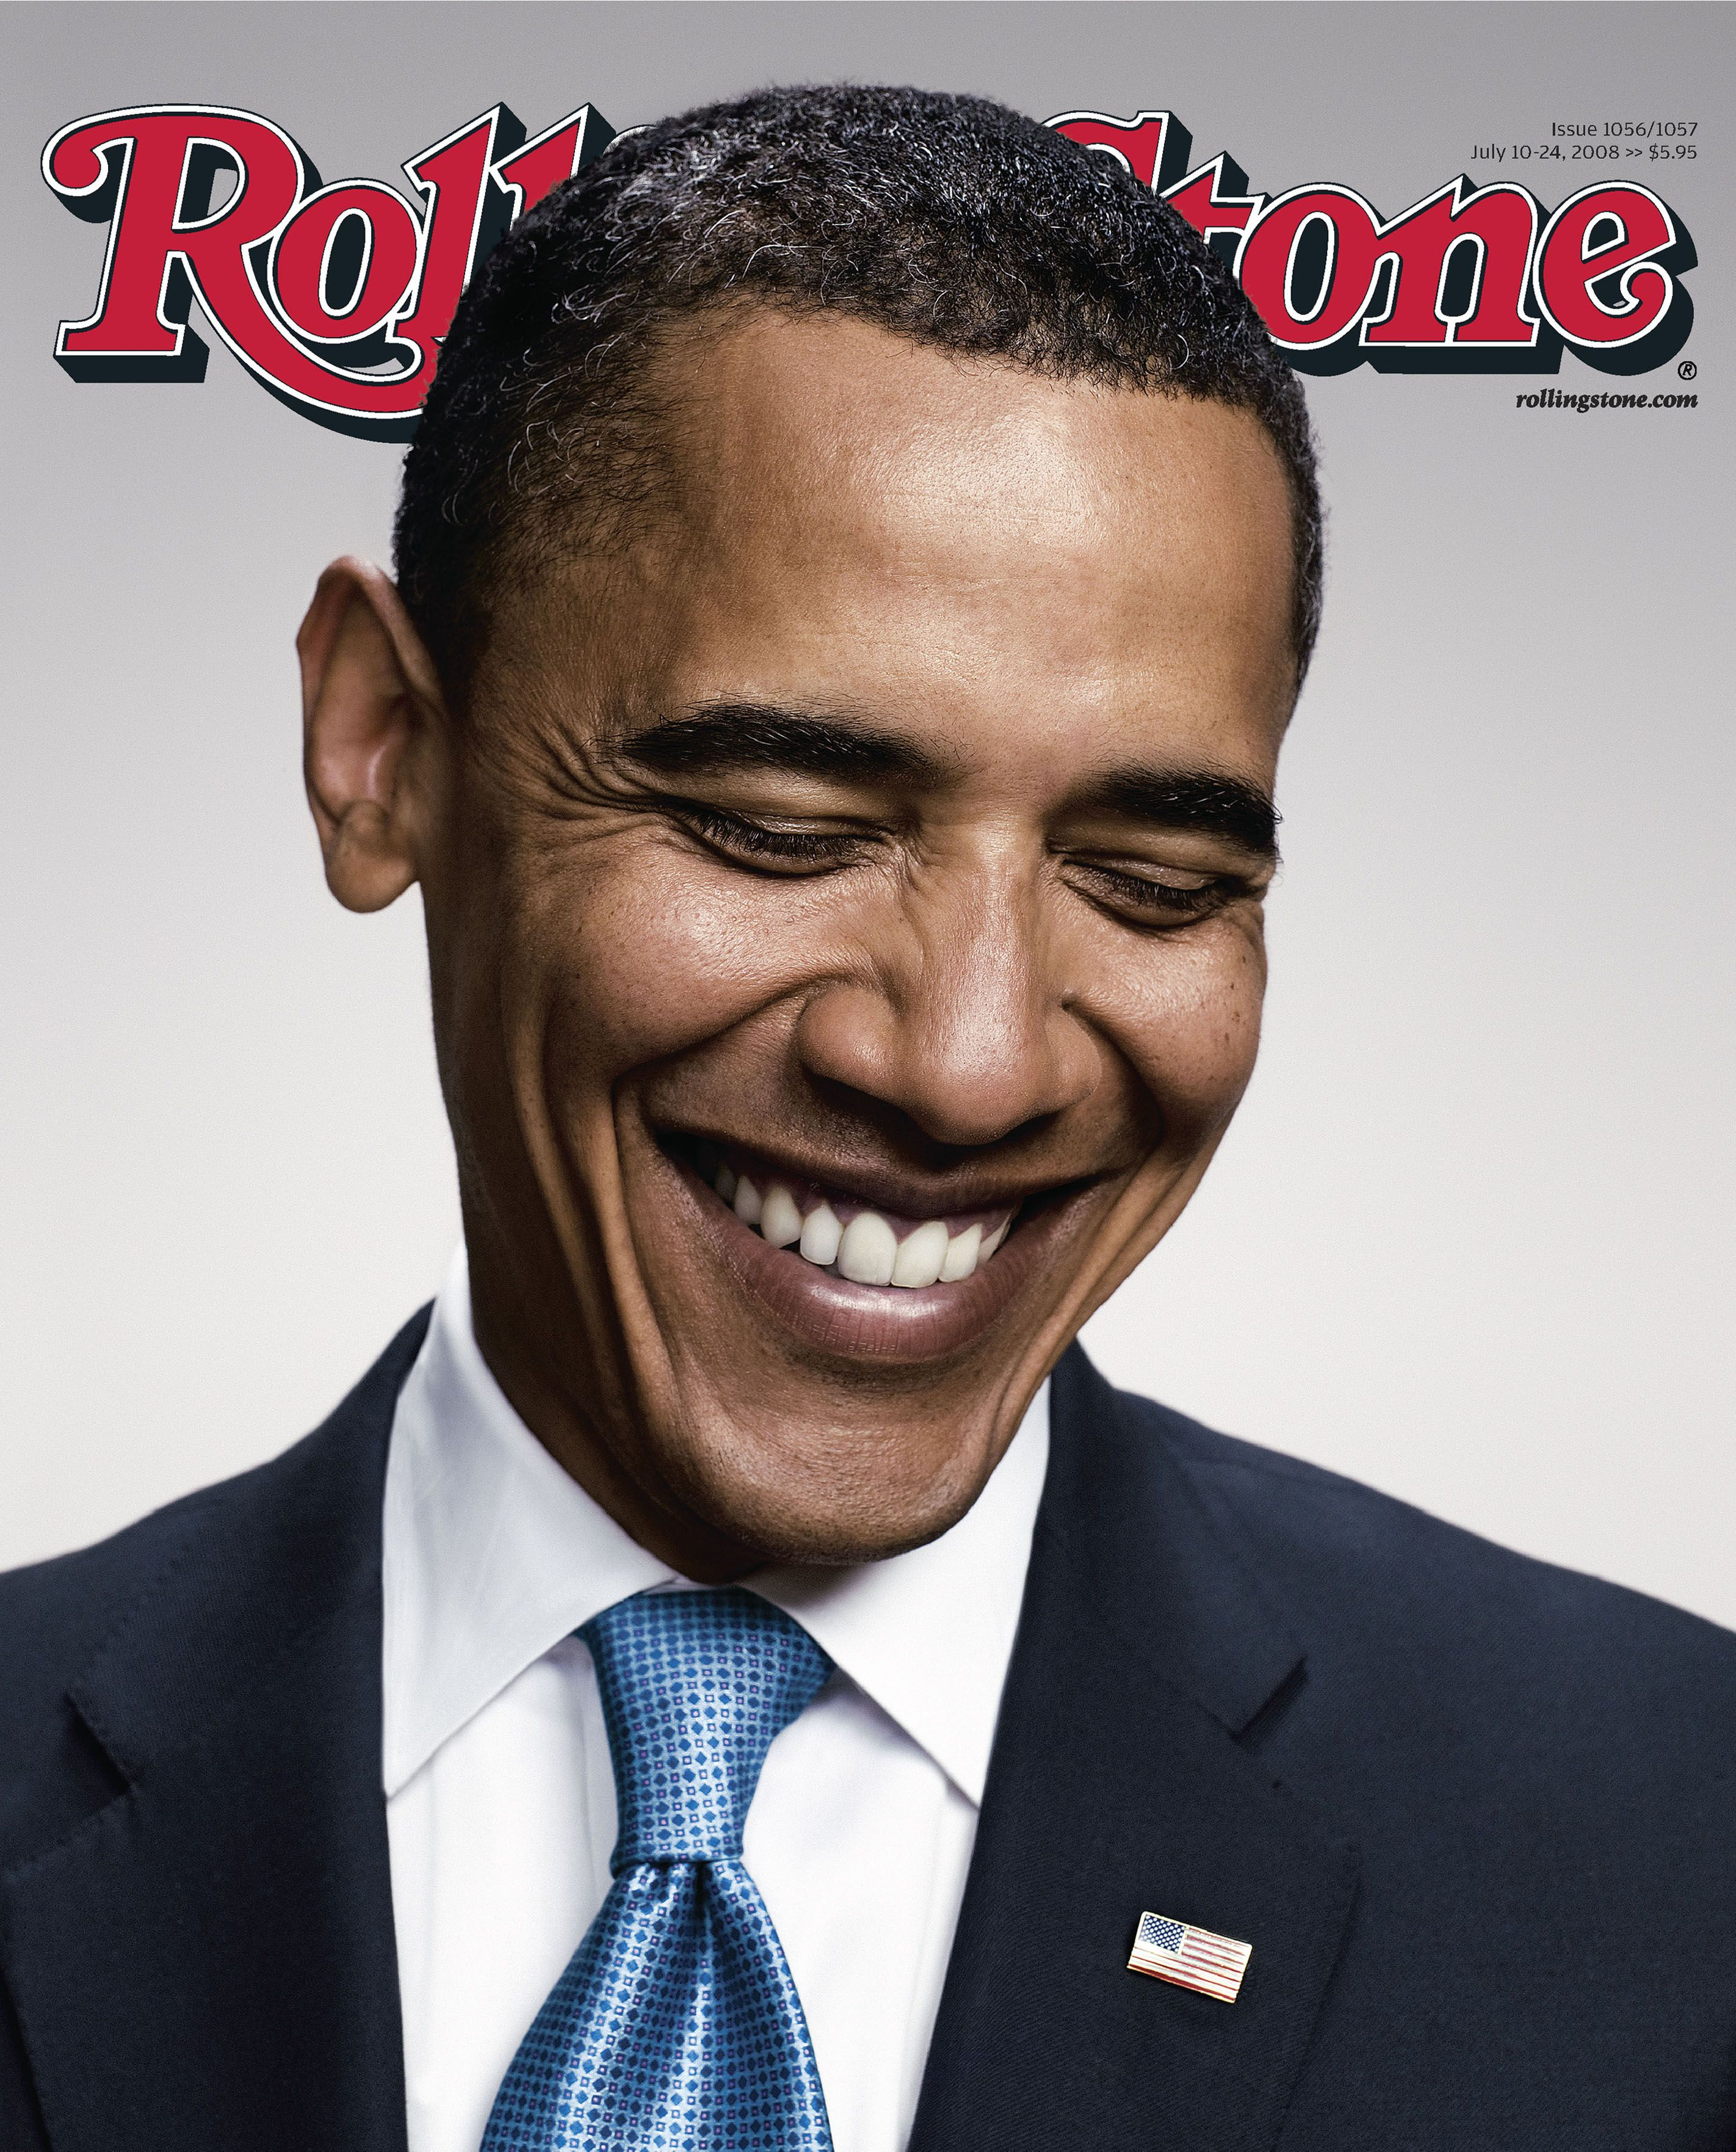 Barack Obama (Peter Yang) Rolling Stone, 2008